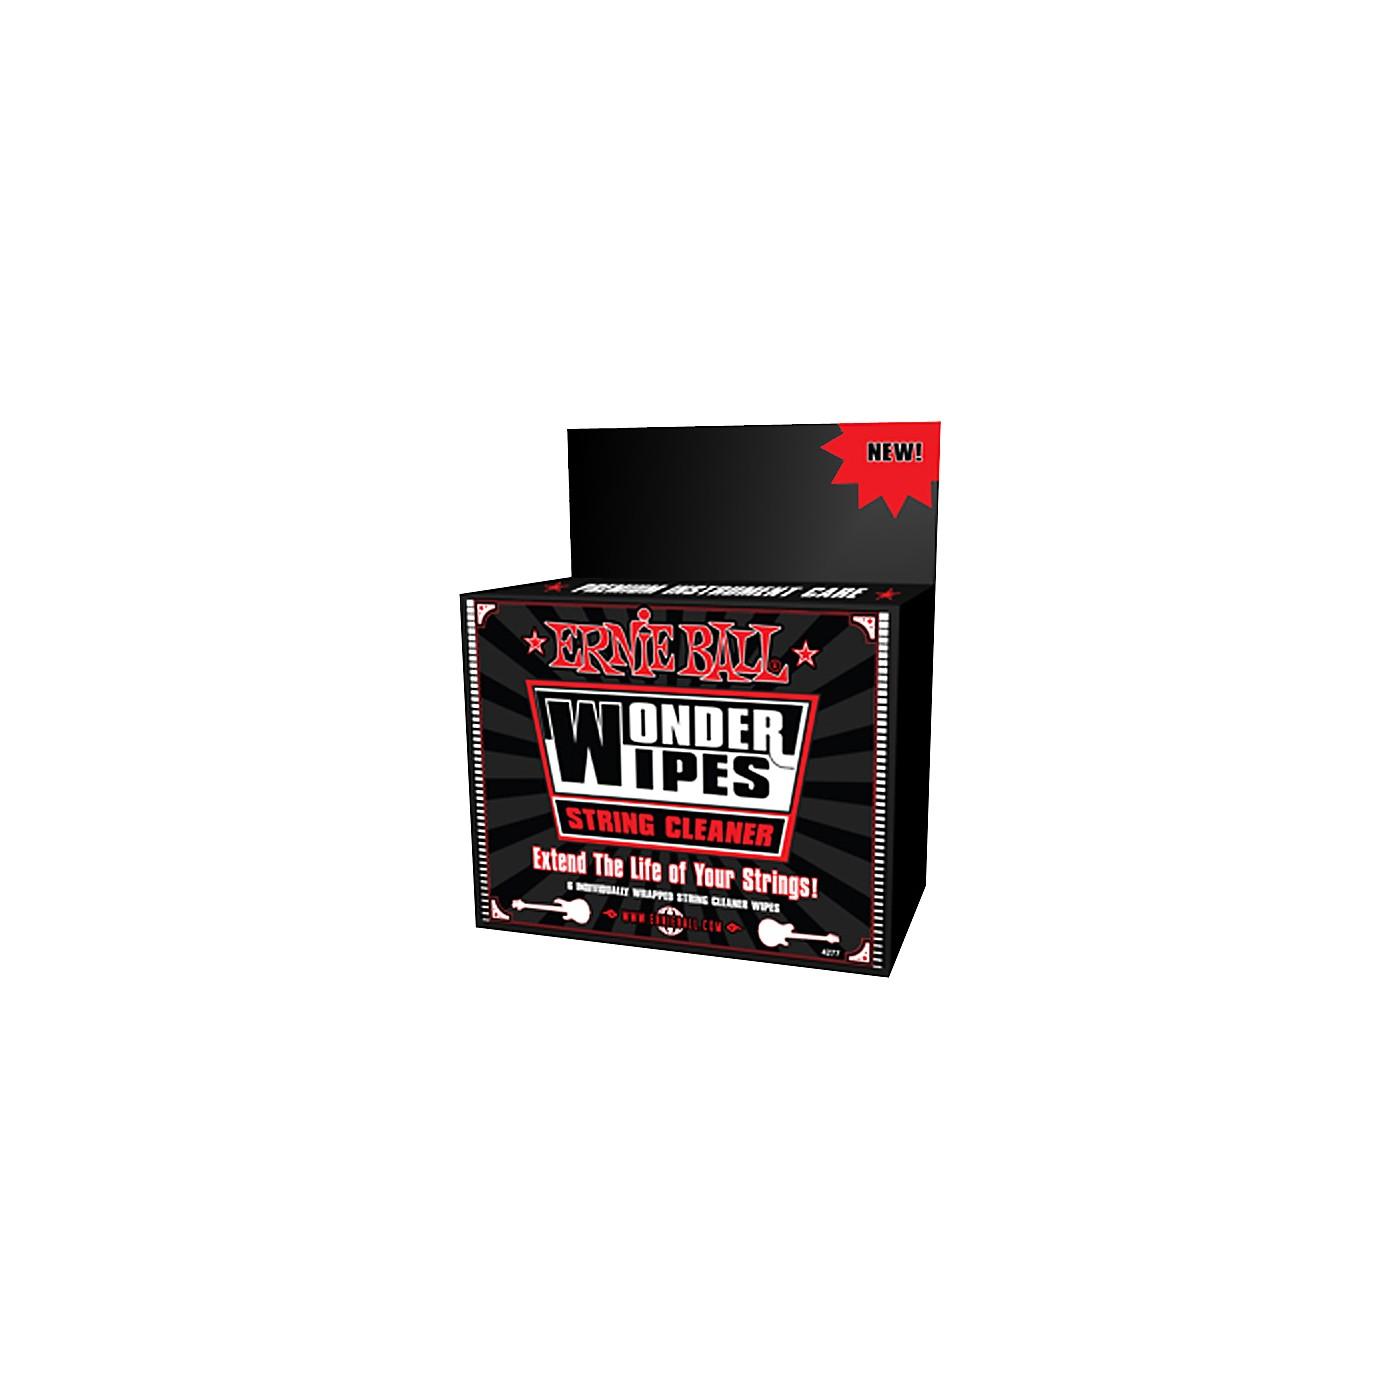 Ernie Ball Wonder Wipe String Cleaner 6-pack thumbnail